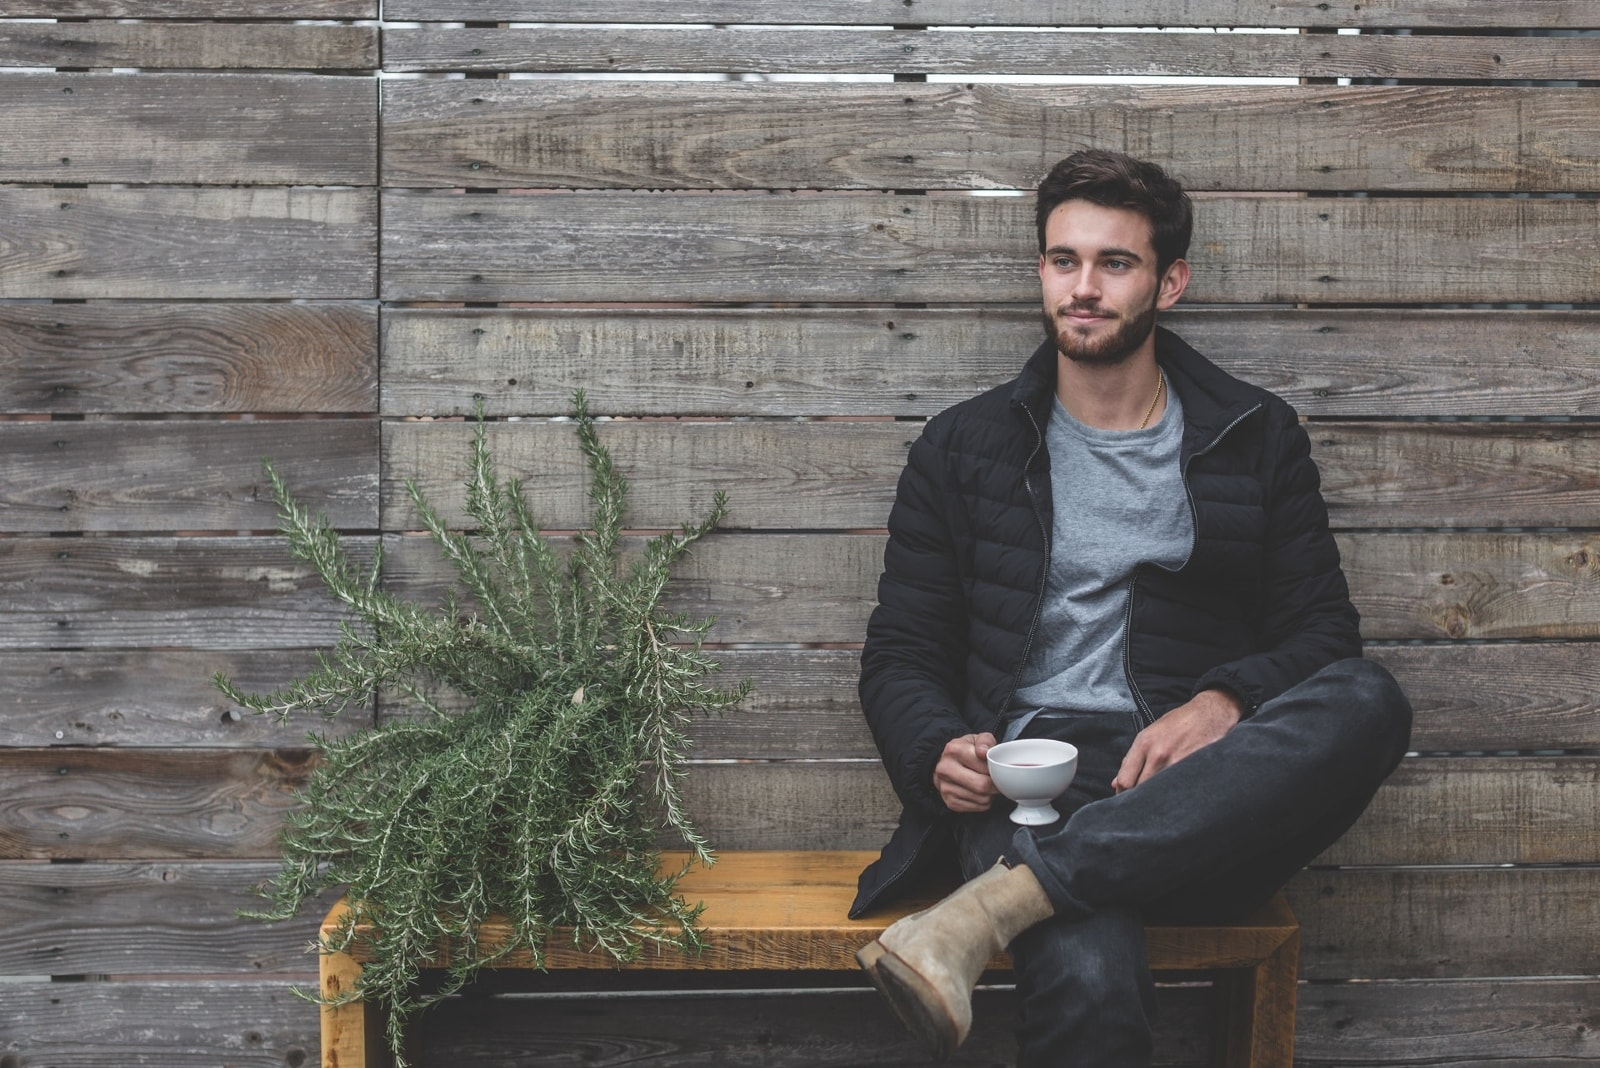 man having coffee while sitting on bench